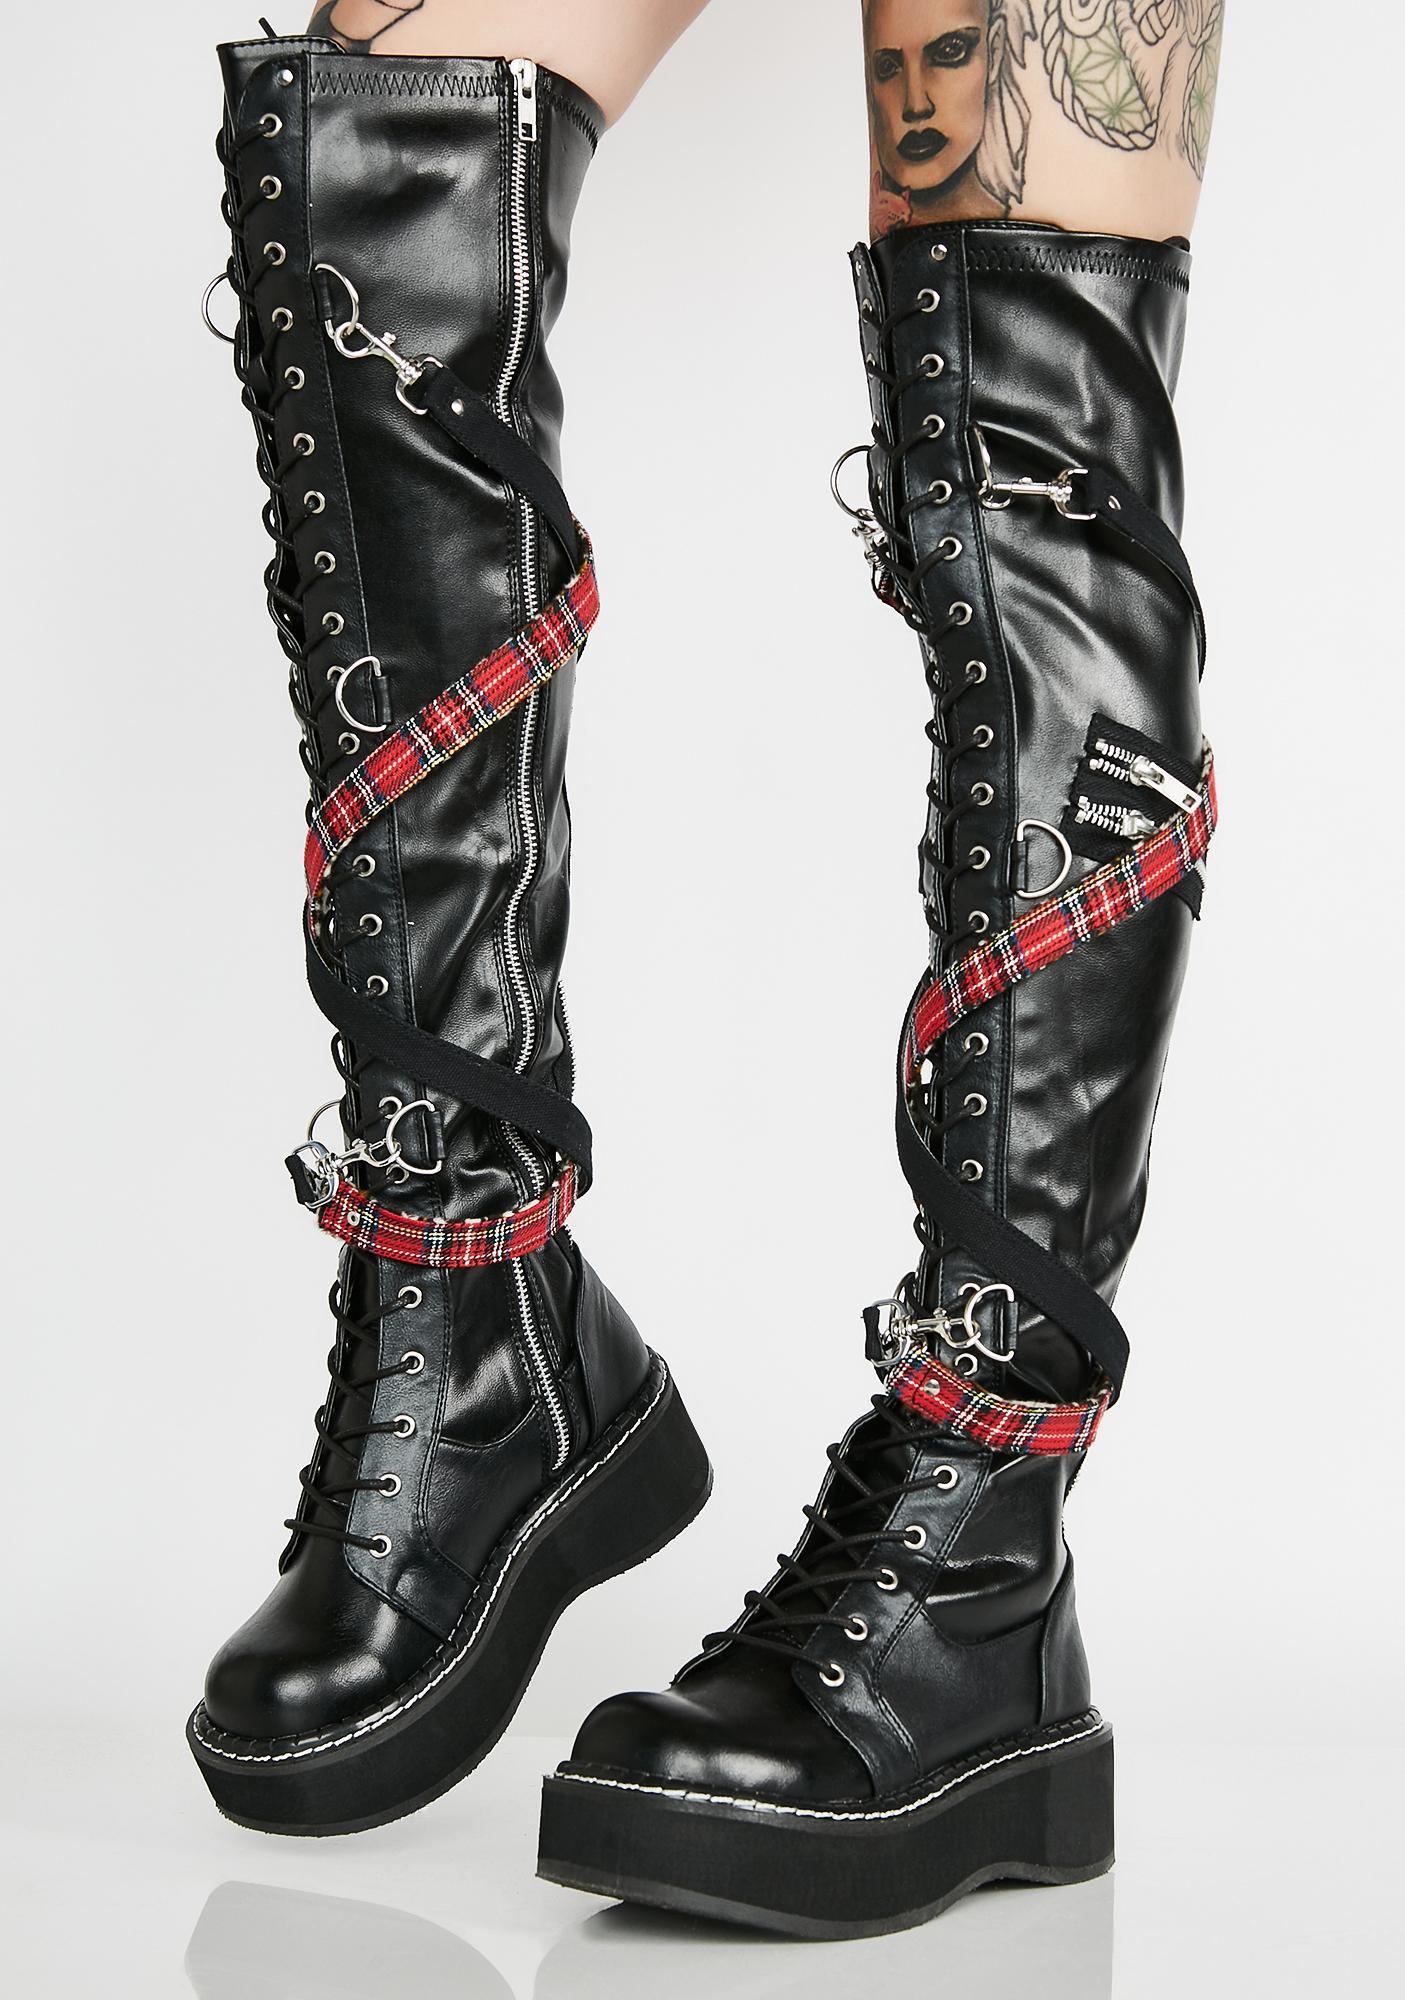 Demonia Madame Anarchy Bondage Boots